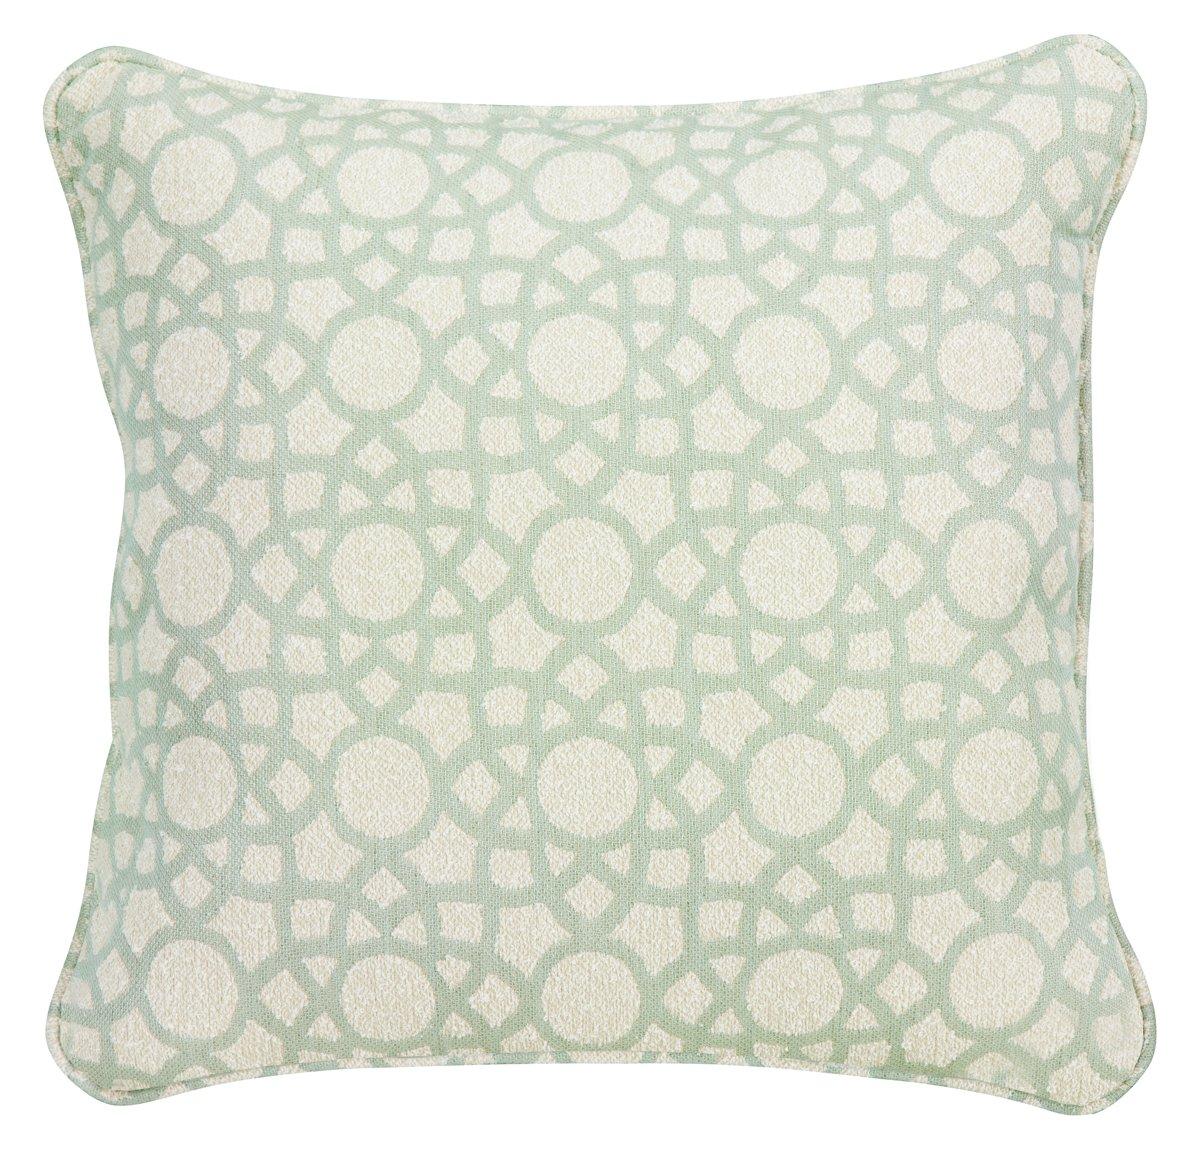 Sophisticate Light Green Fabric Accent Pillow